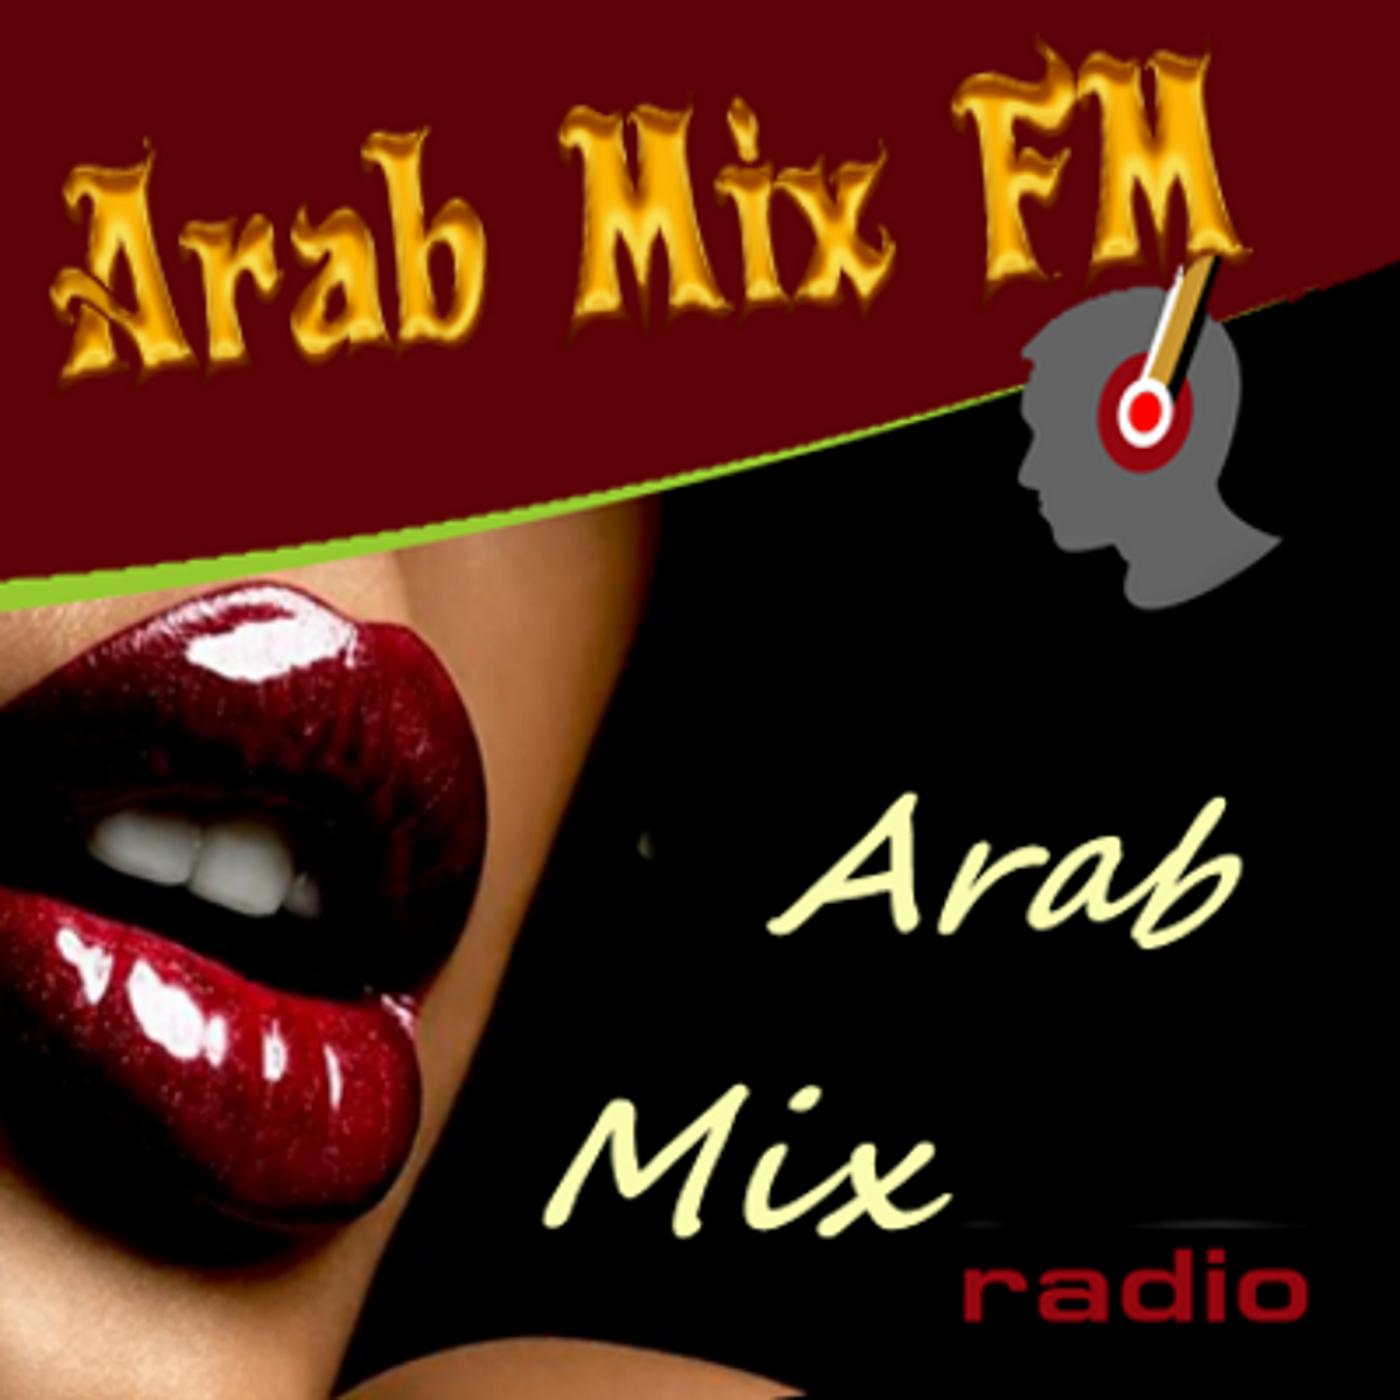 Arab Mix FM Logo